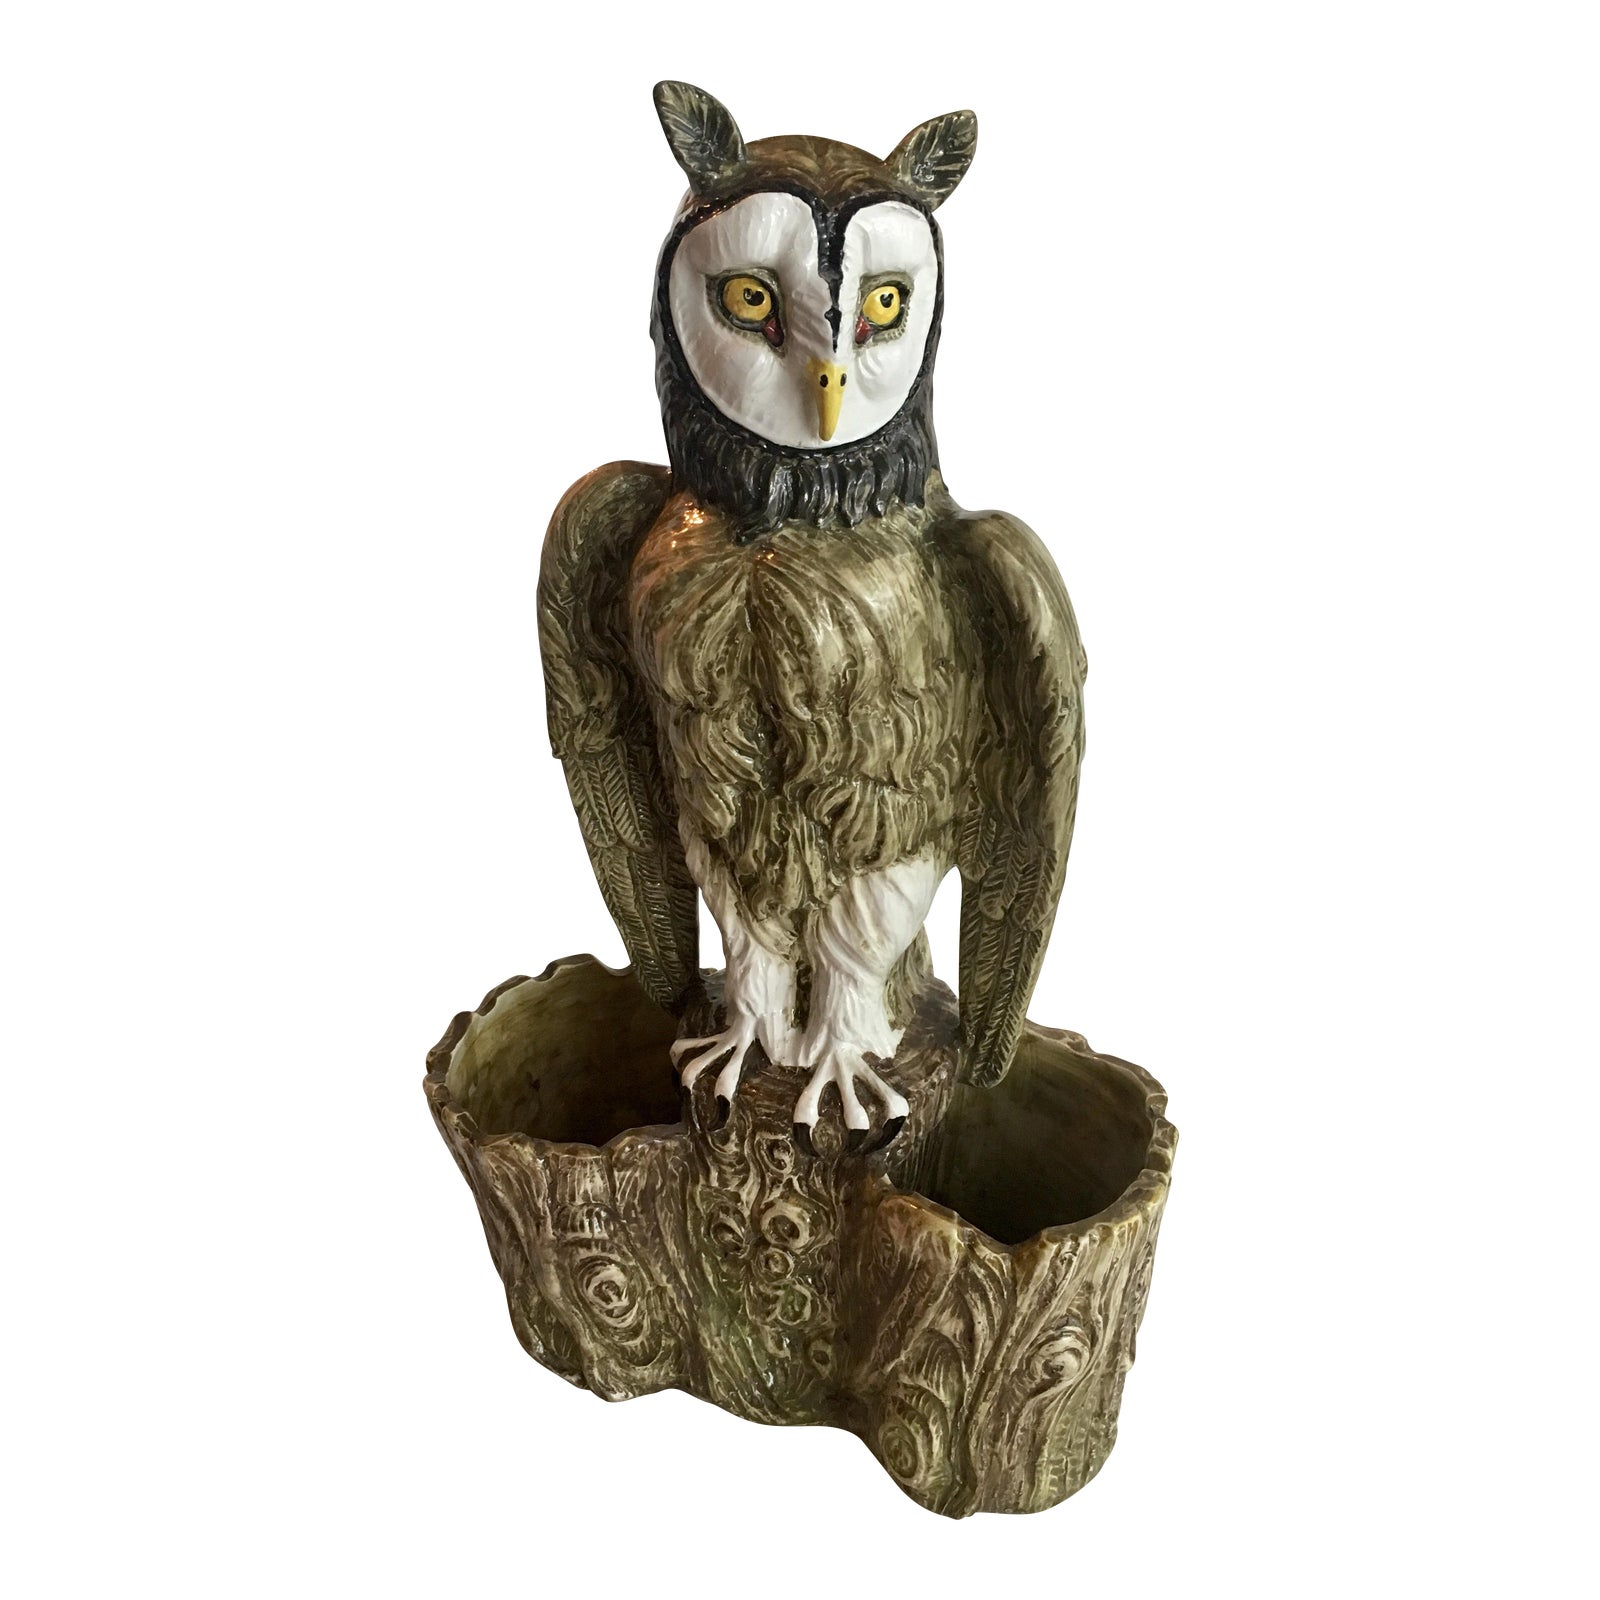 Life Size Italian Ceramic Owl Statue / Planter   Chairish